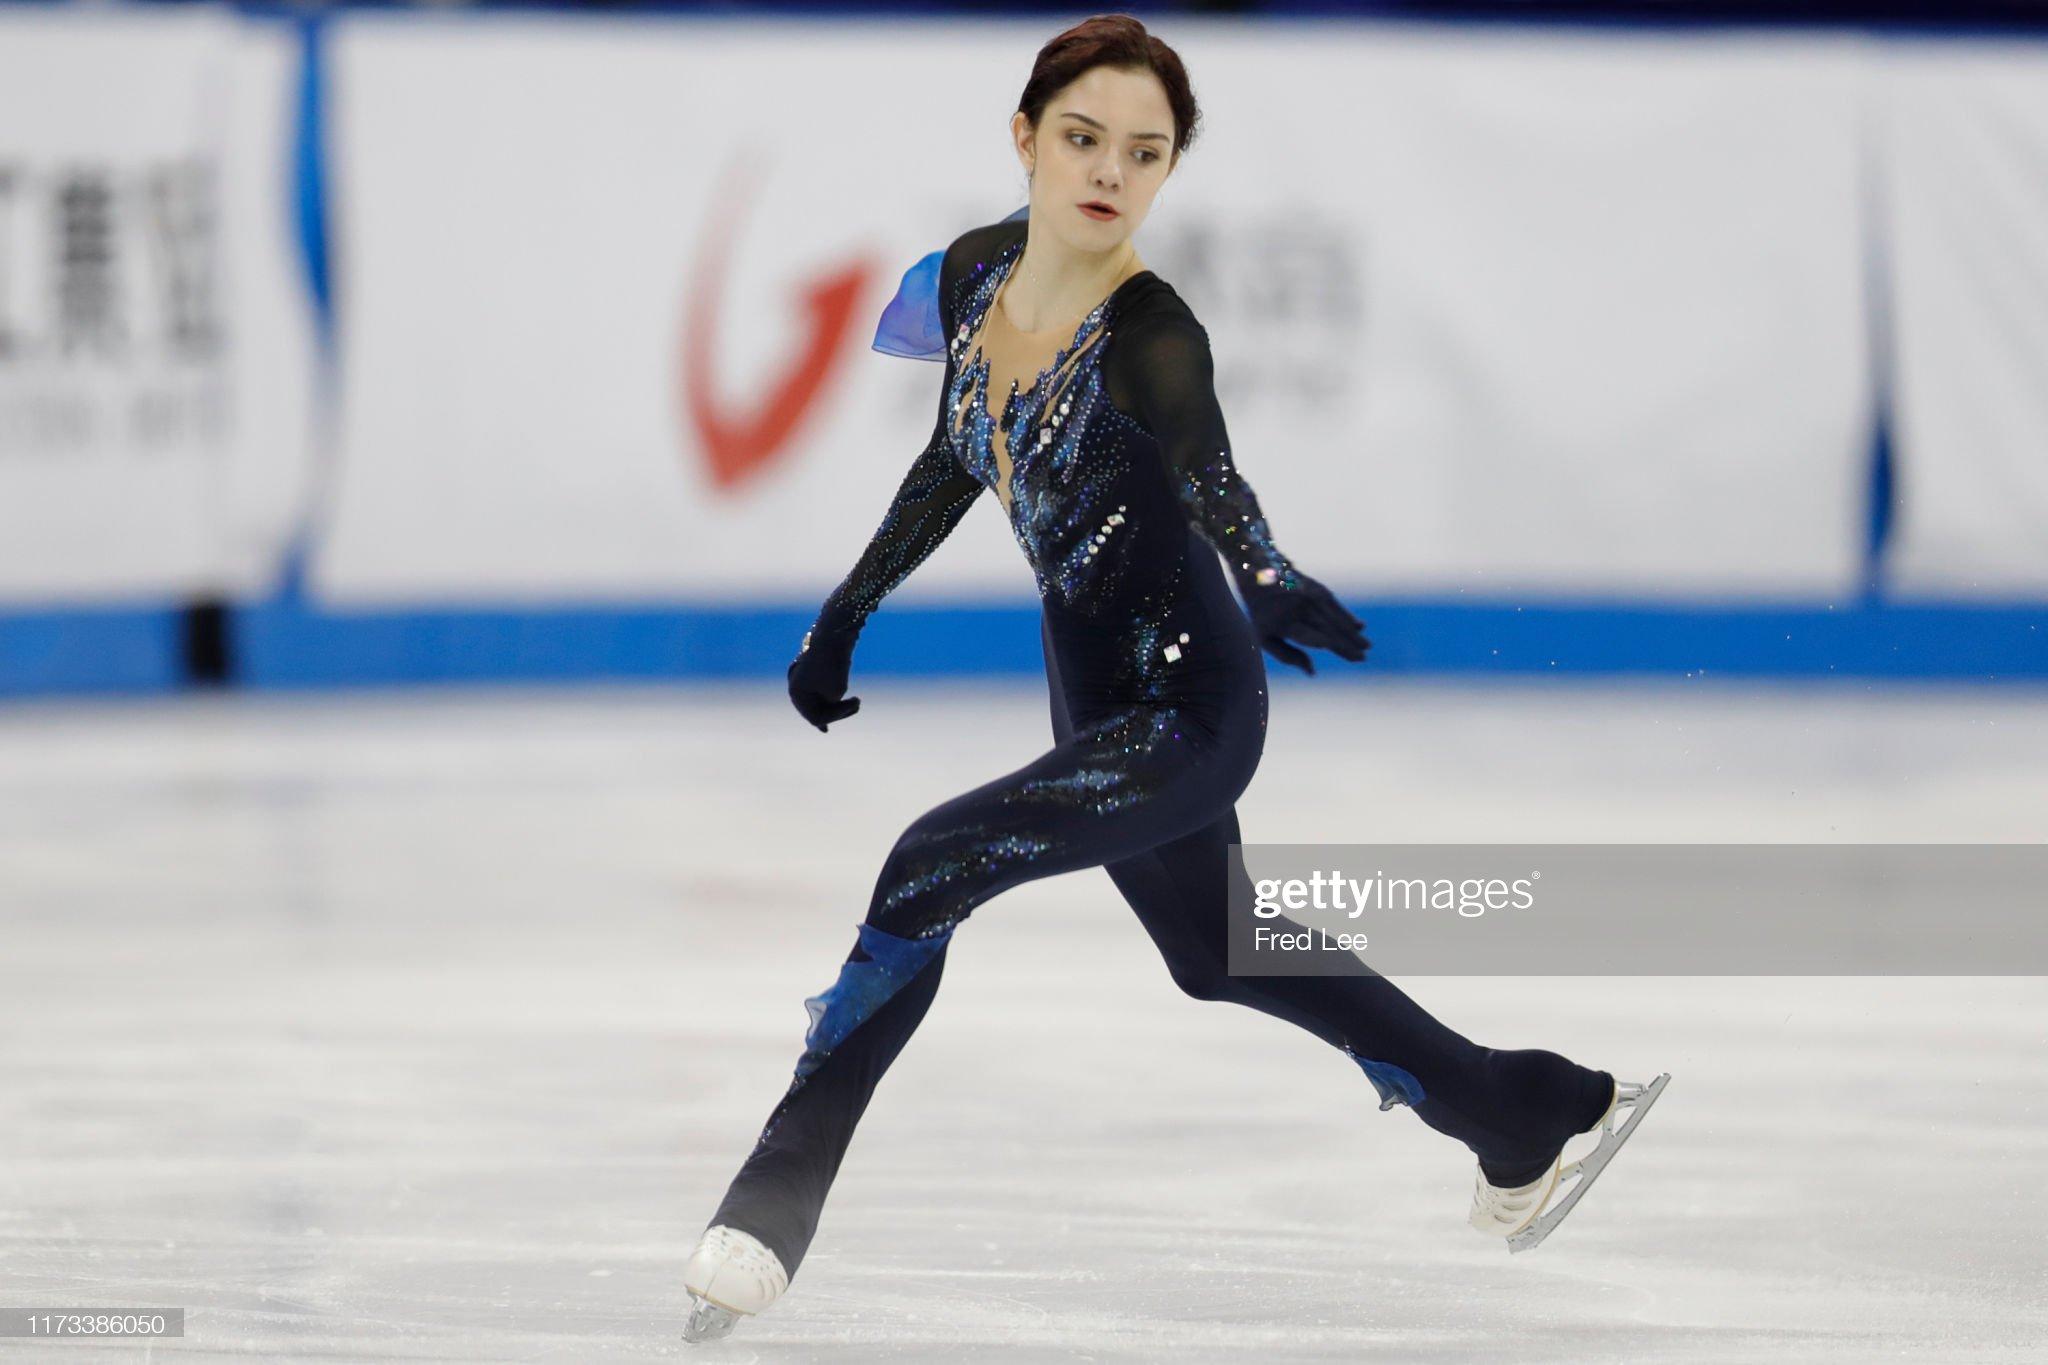 Shanghai Trophy (Invitational). 3-5 октября 2019. Шанхай (Китай) - Страница 3 Evgenia-medvedeva-of-russia-performs-in-the-ladies-short-program-the-picture-id1173386050?s=2048x2048